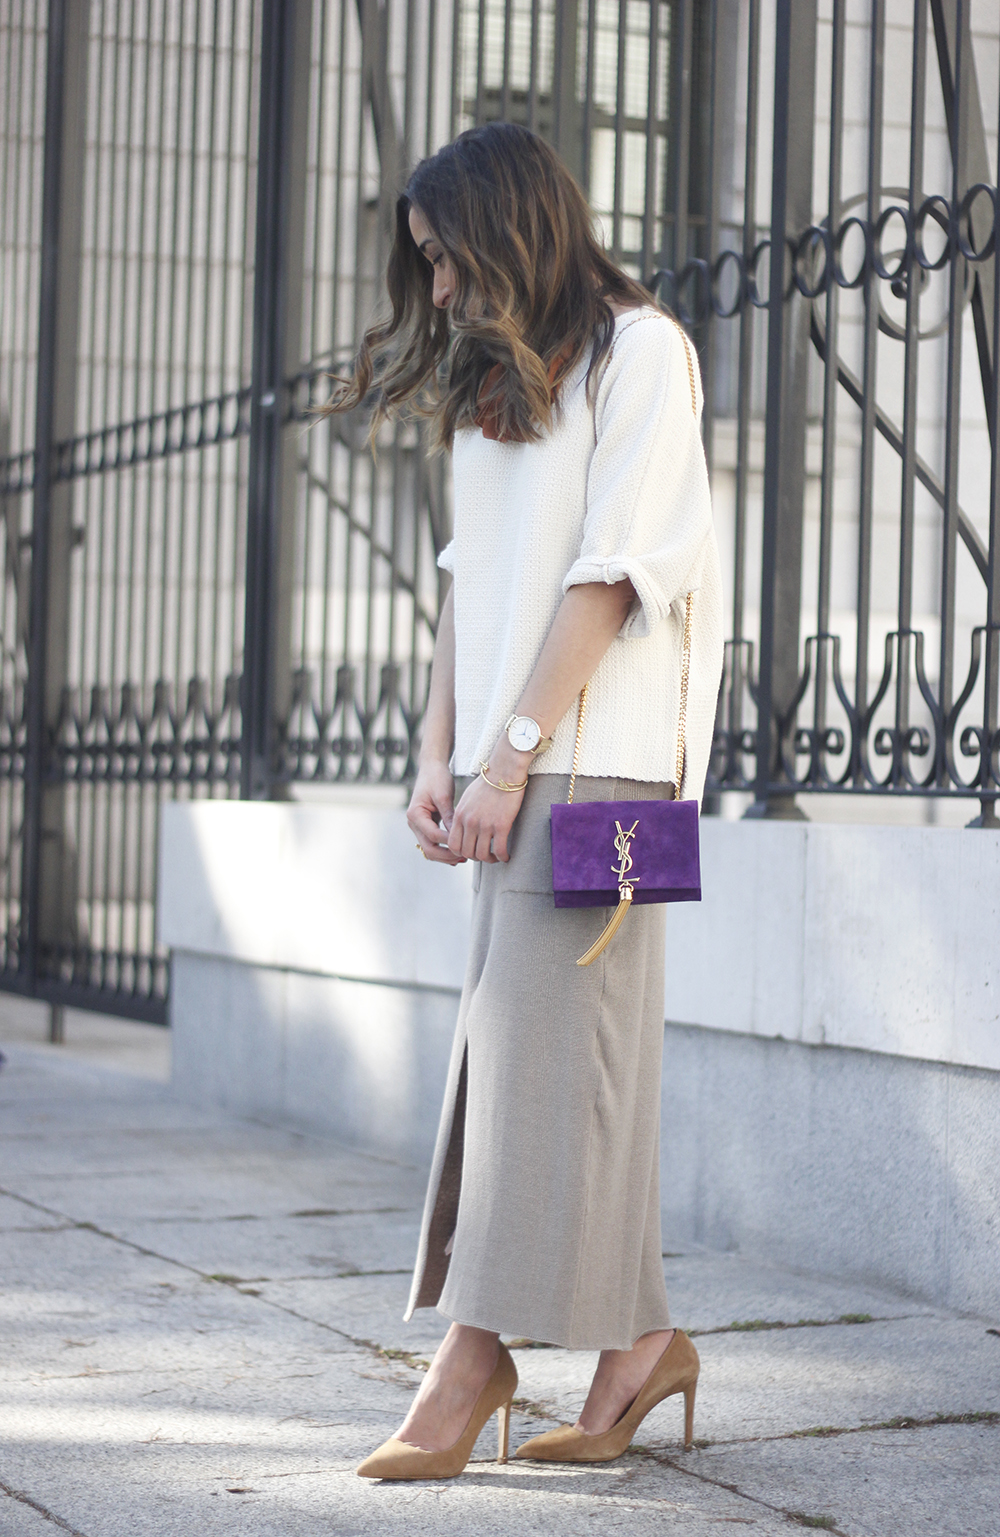 maxi grey knitted skirt saint laurent handbag nude heels outfit03